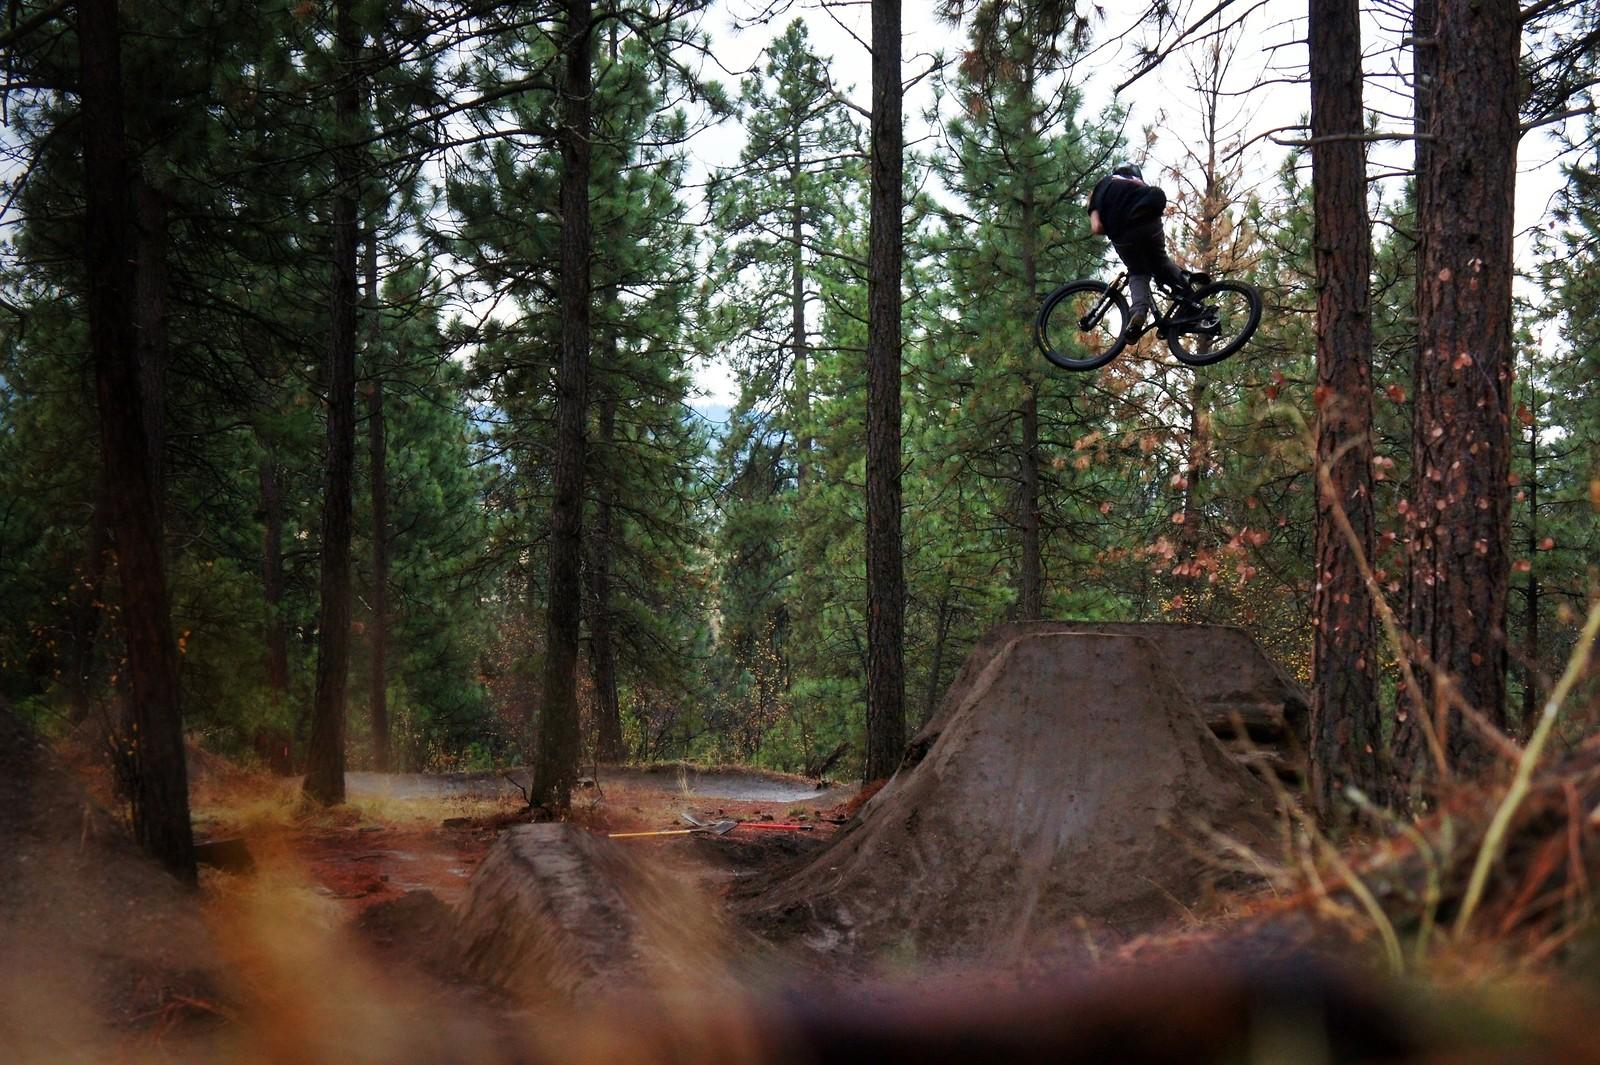 Fall rebuild time  - Skye_Schillhammer - Mountain Biking Pictures - Vital MTB